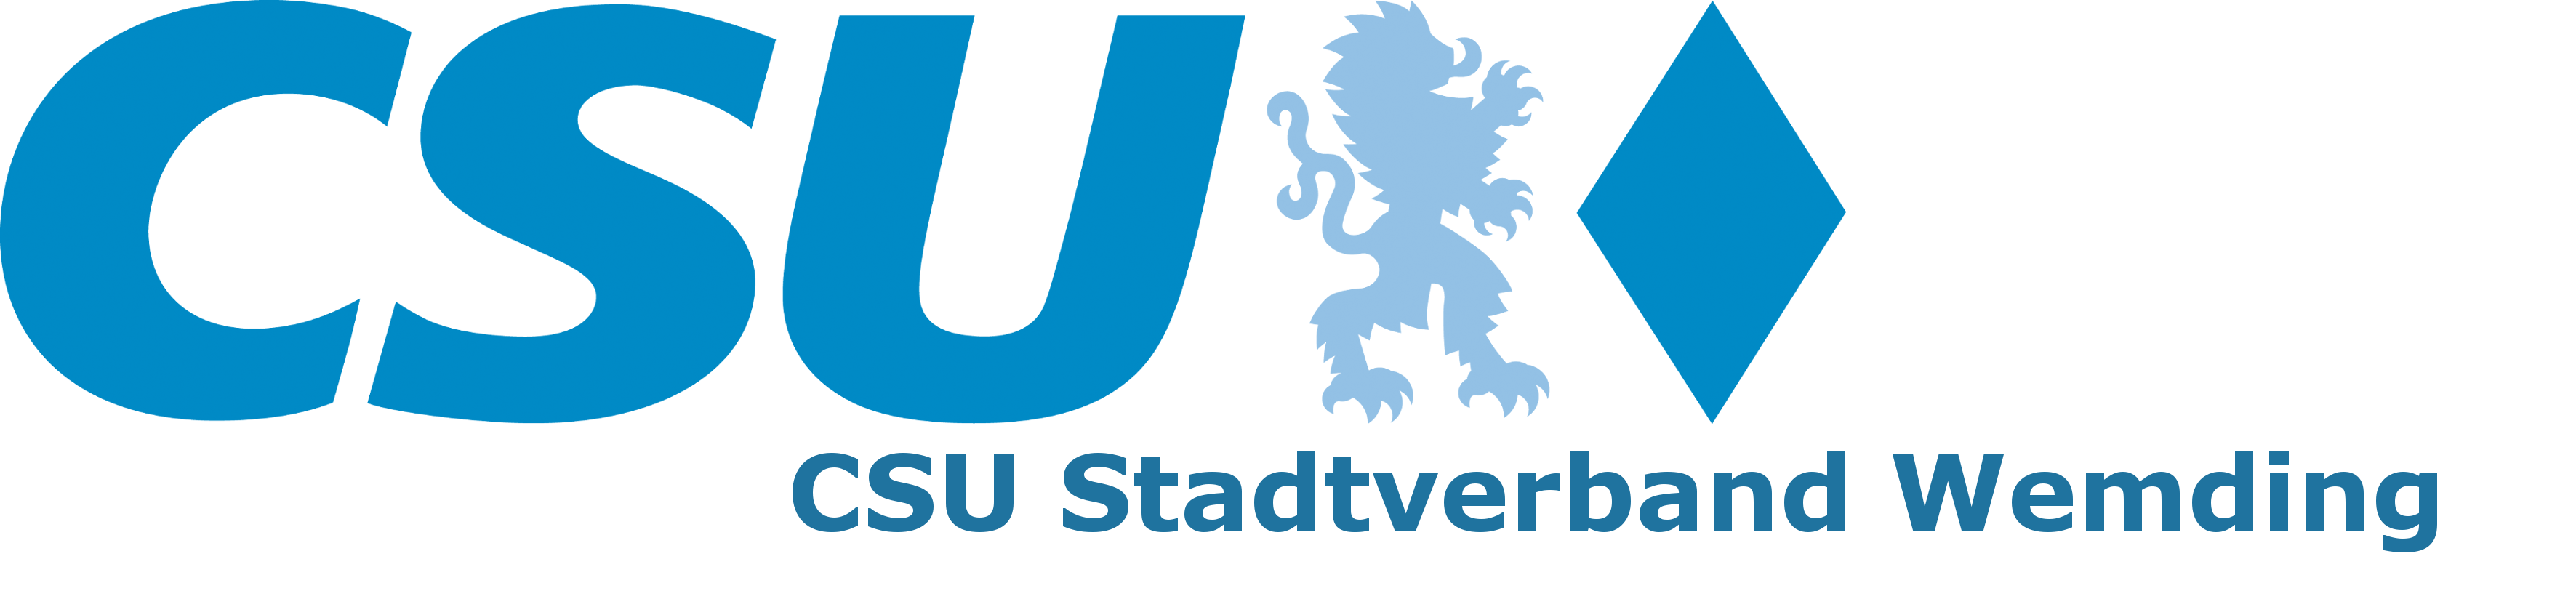 CSU Stadtverband Wemding Logo